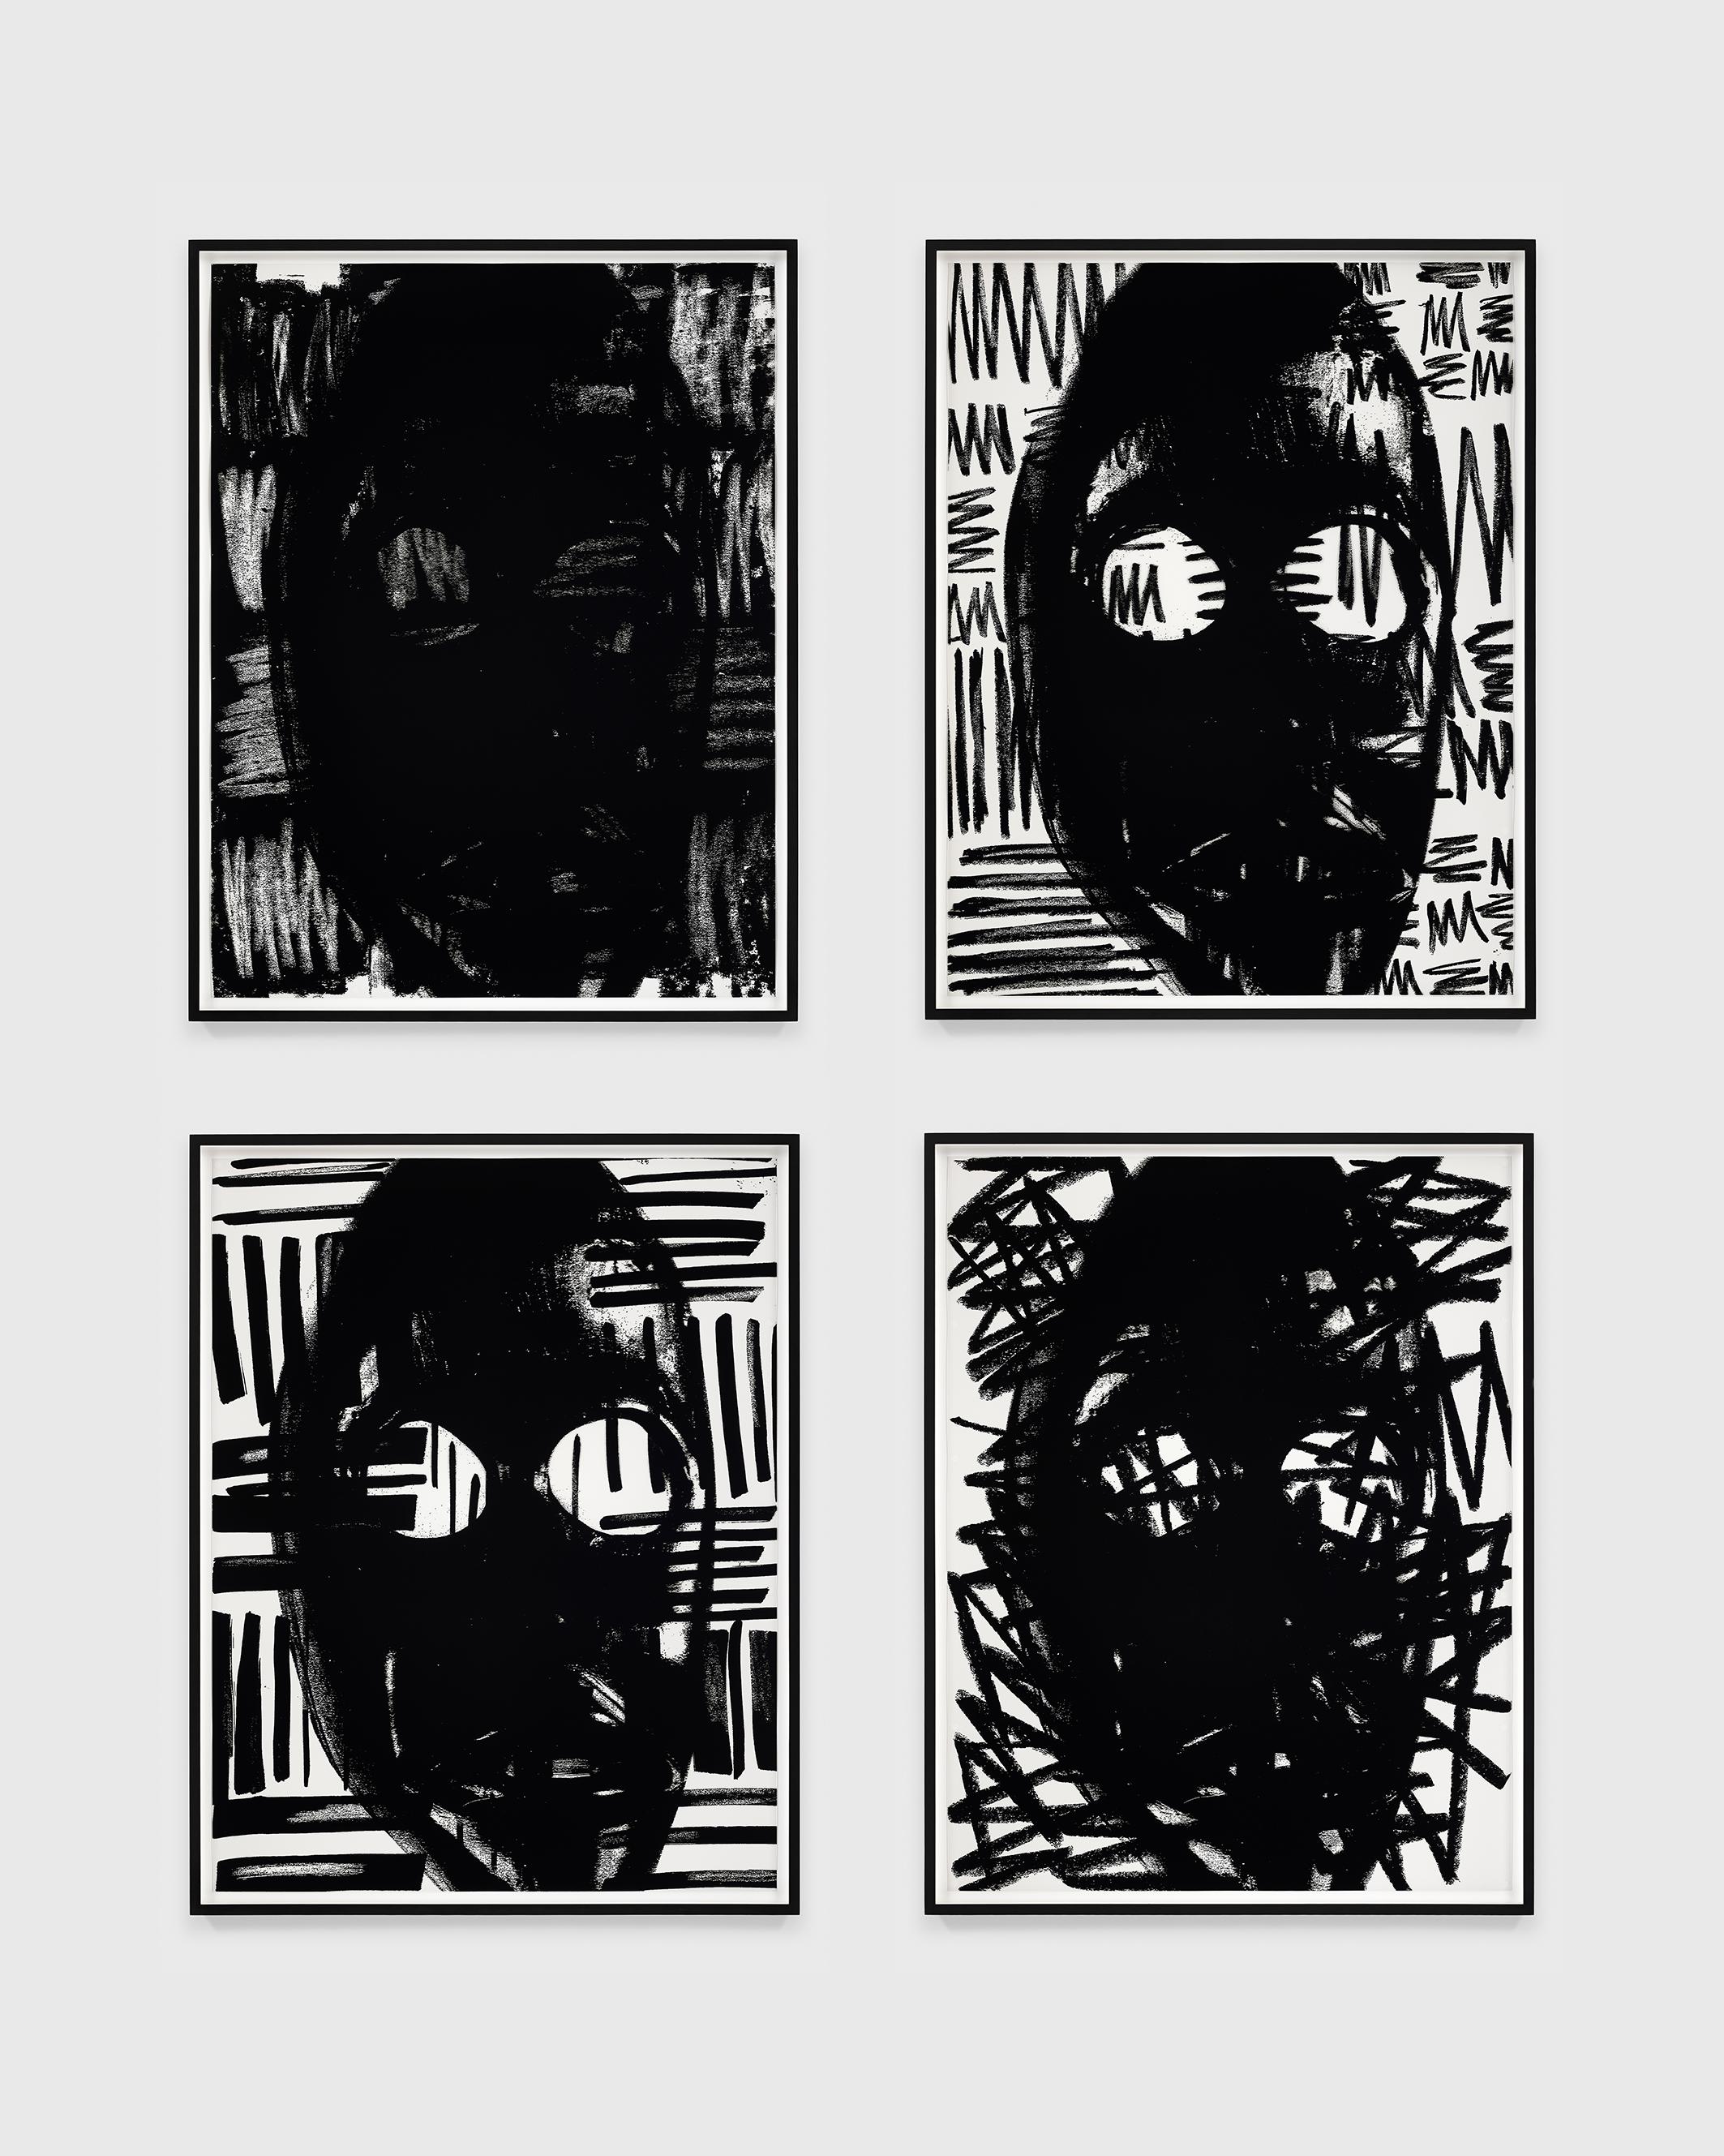 Adam Pendleton, Untitled (masks), 2018 © Adam Pendleton. Courtesy the artist and Galerie Eva Presenhuber, Zurich / New York